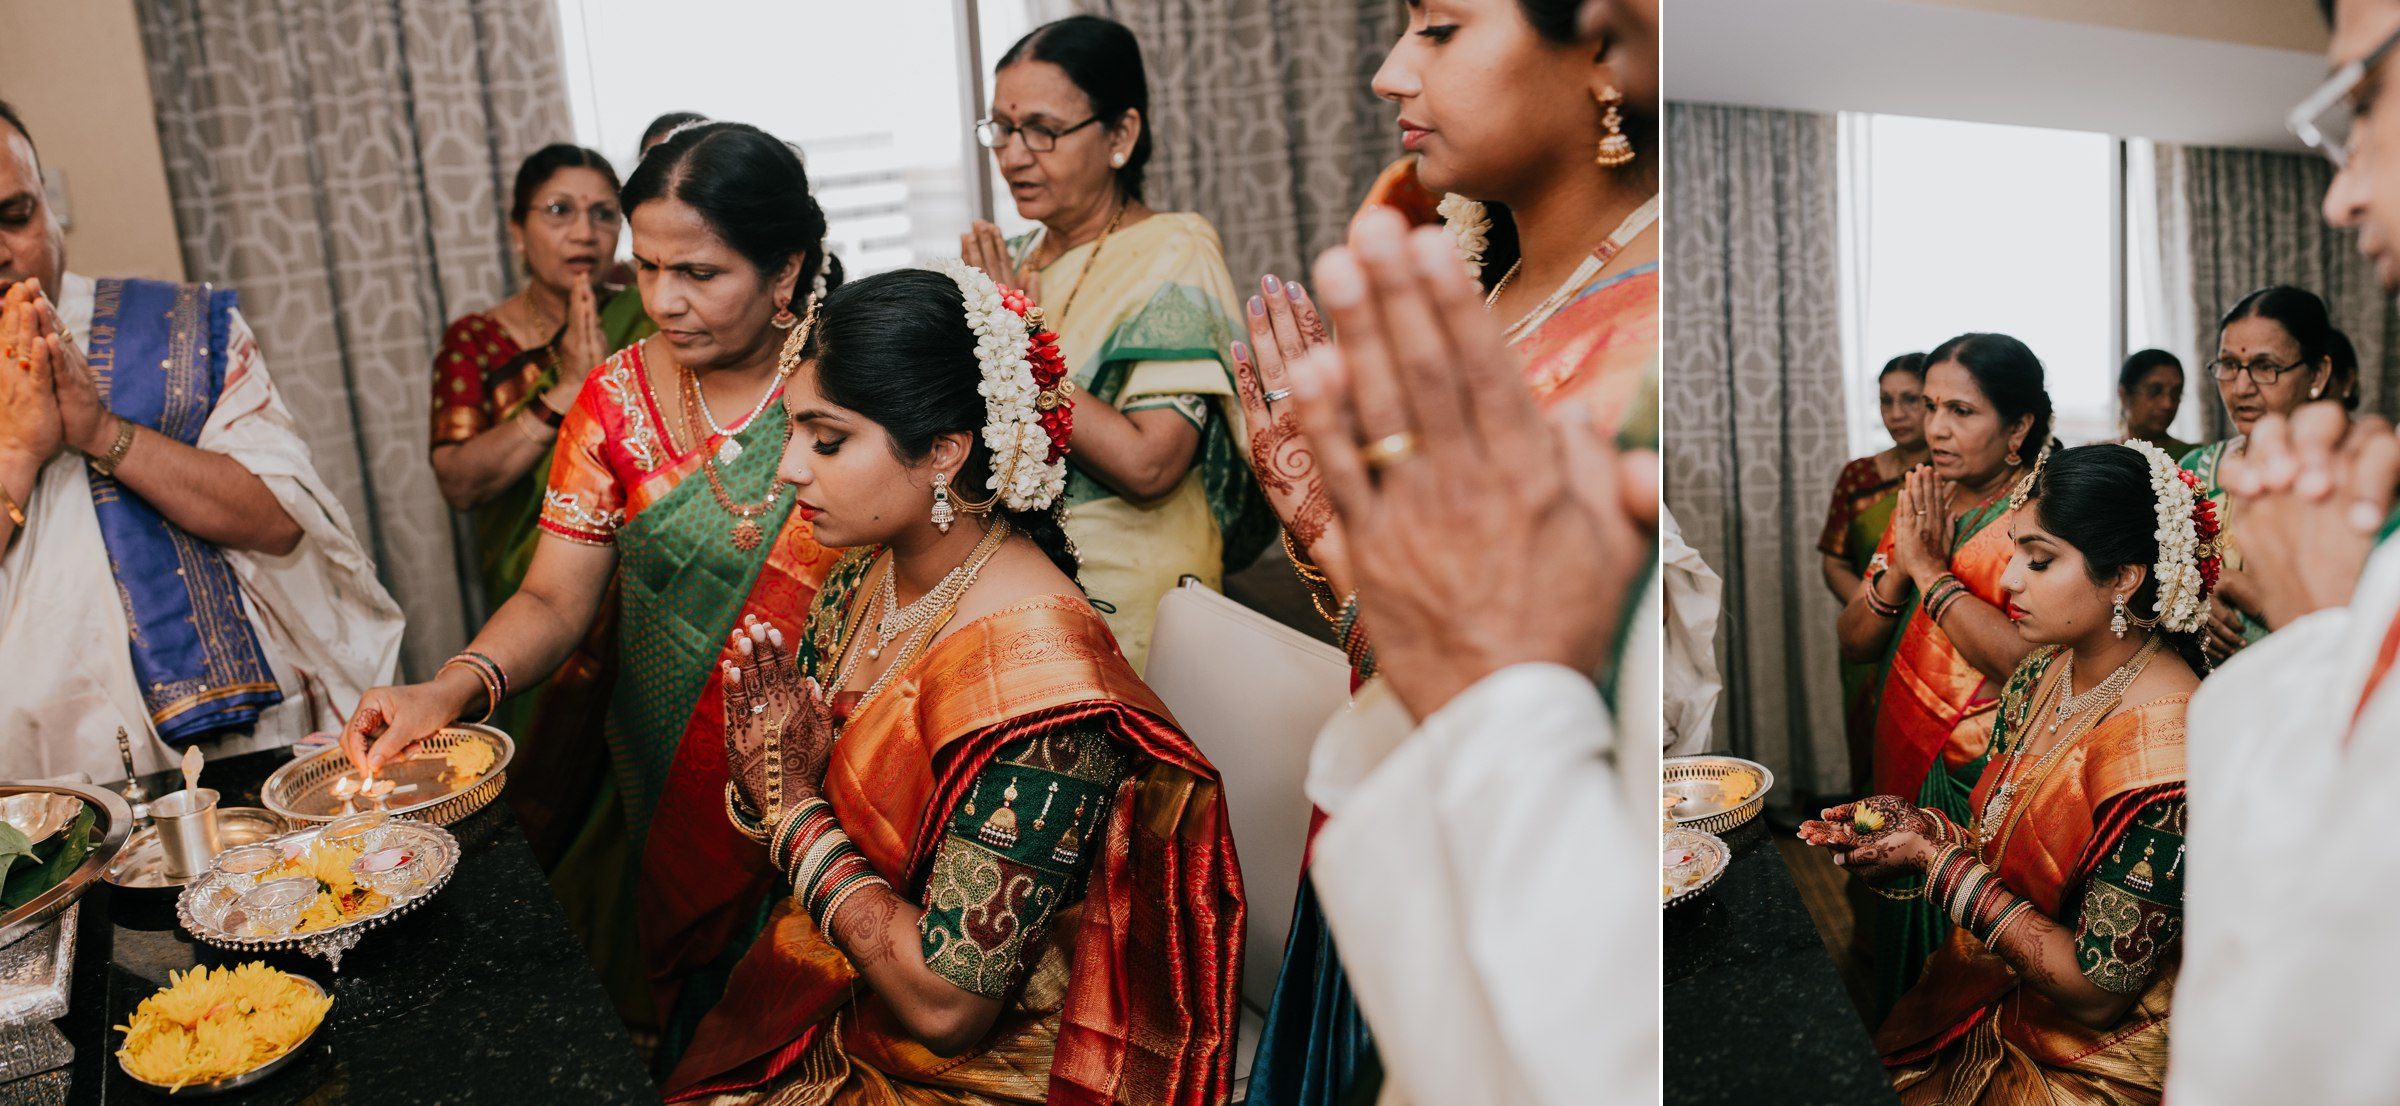 indian wedding minneapolis minnesota texas austin wedding elopement destination intimate best photographer_0003.jpg